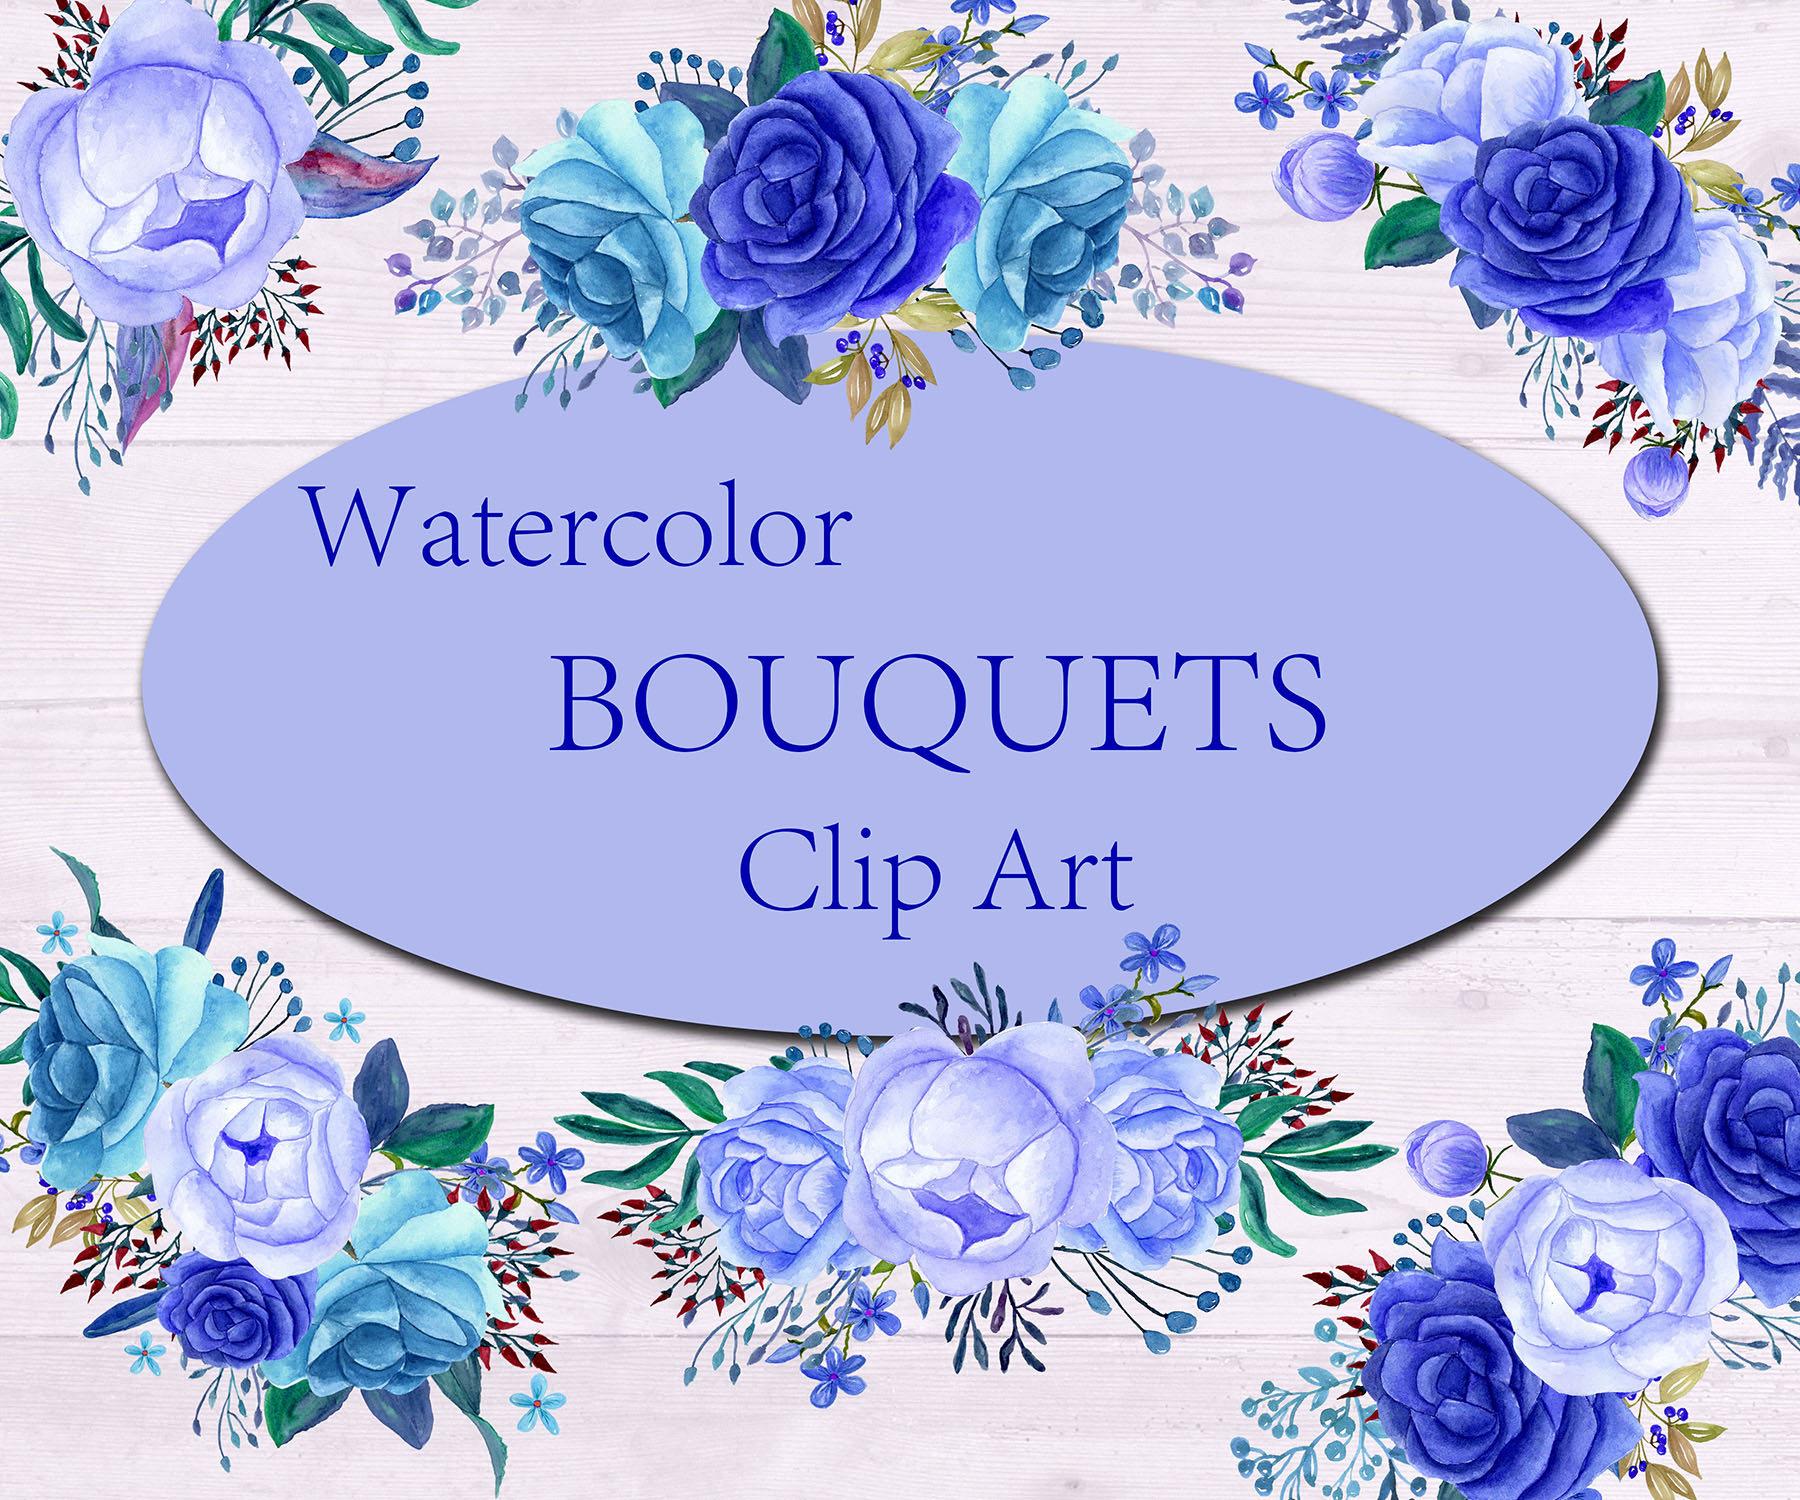 Blue watercolor bouquets clip artfloral bouquetsblue etsy blue watercolor bouquets clip artfloral bouquetsblue flowers bouquet flowers wedding invitationdiy invitesblue floral blue bouquets izmirmasajfo